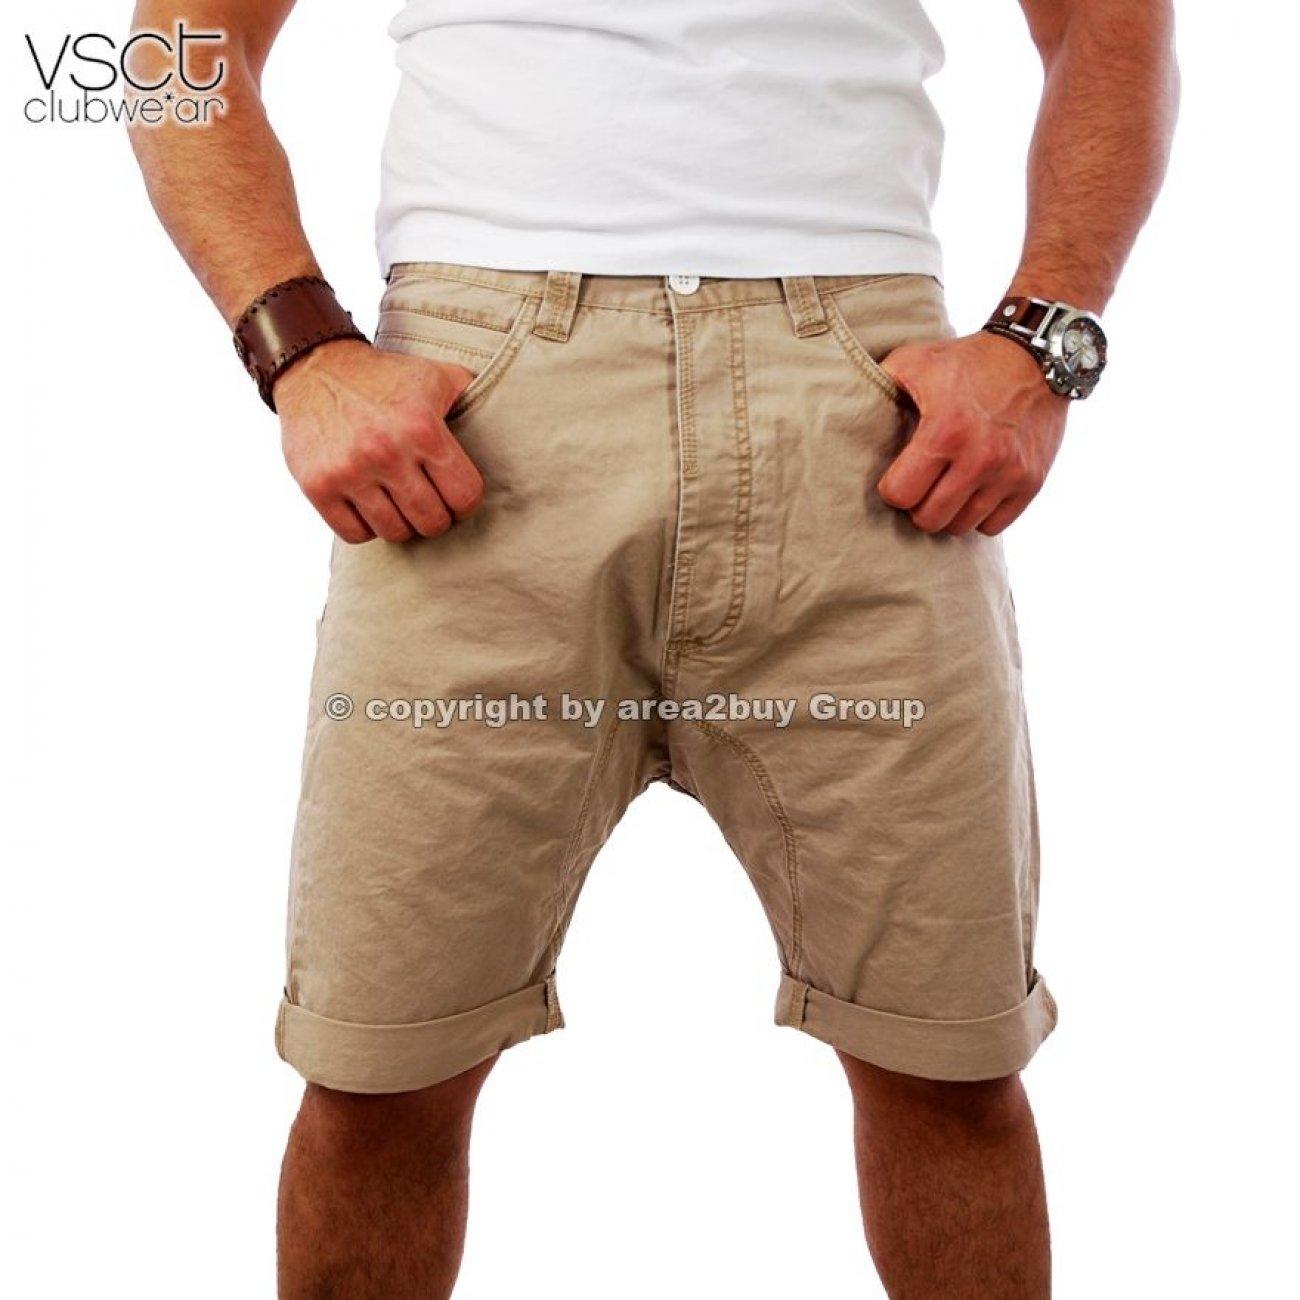 shorts herren beige carpi chino herren von vsct g nstig. Black Bedroom Furniture Sets. Home Design Ideas